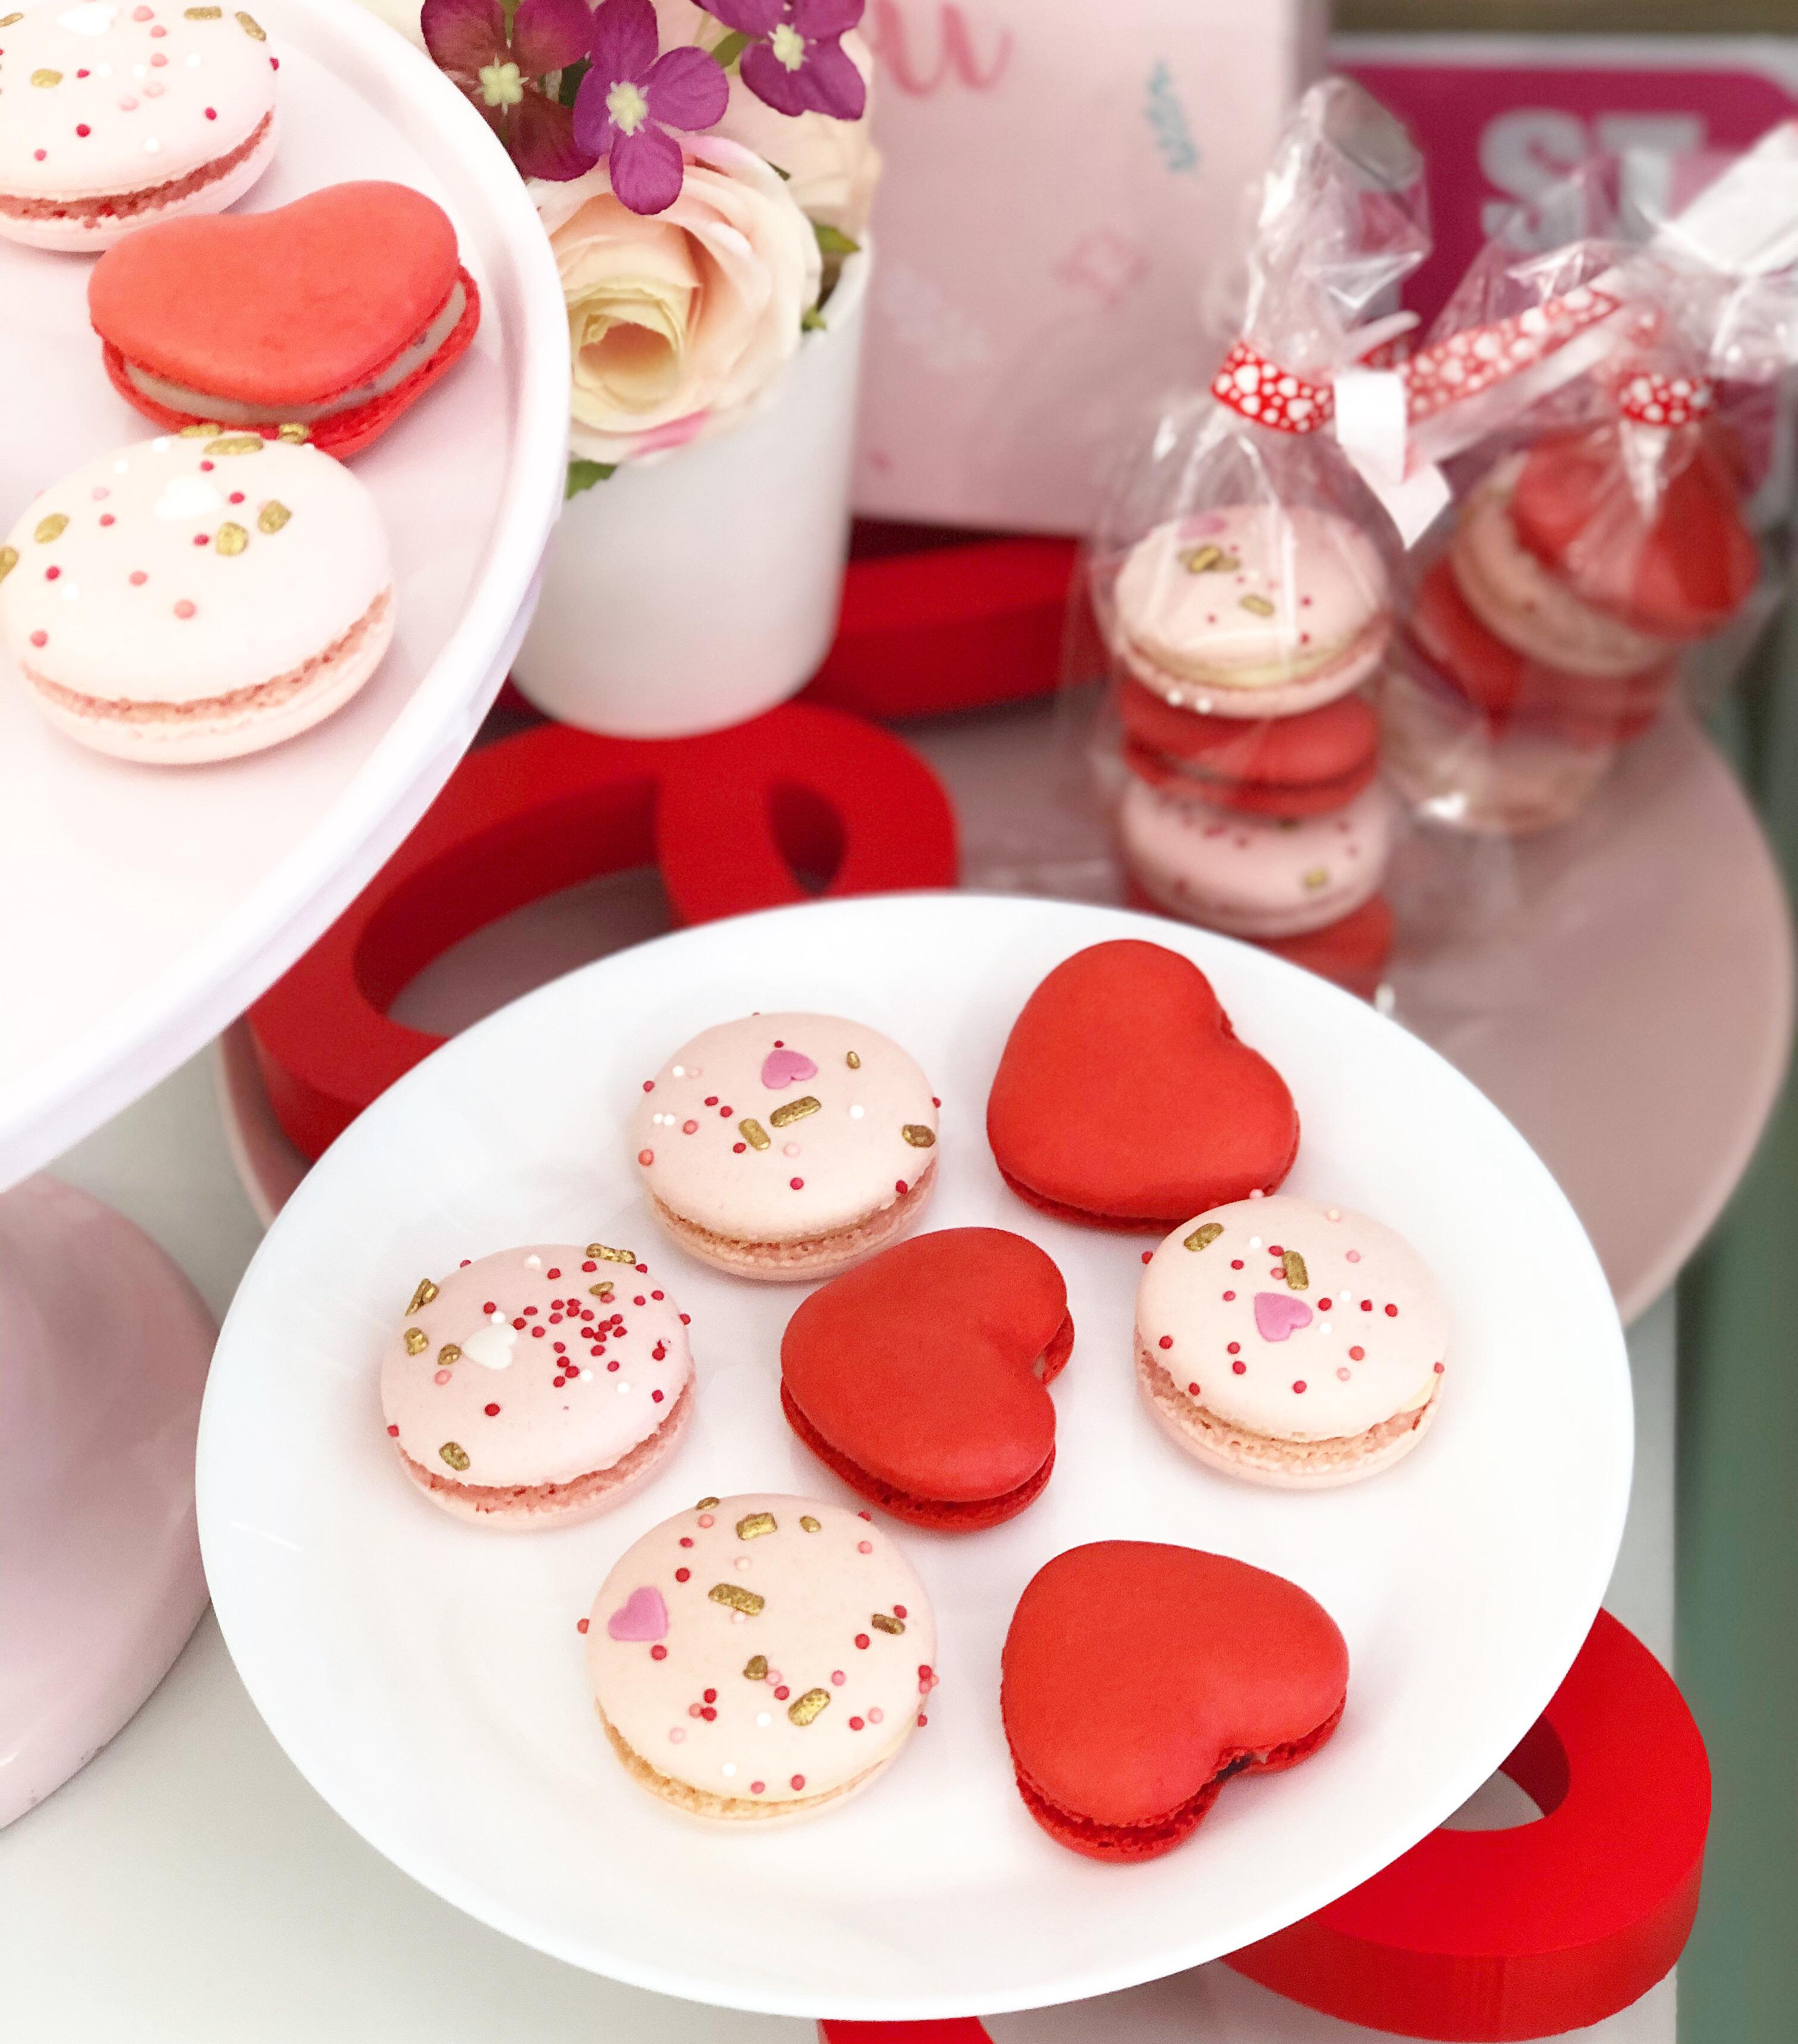 Macarons San Valentin